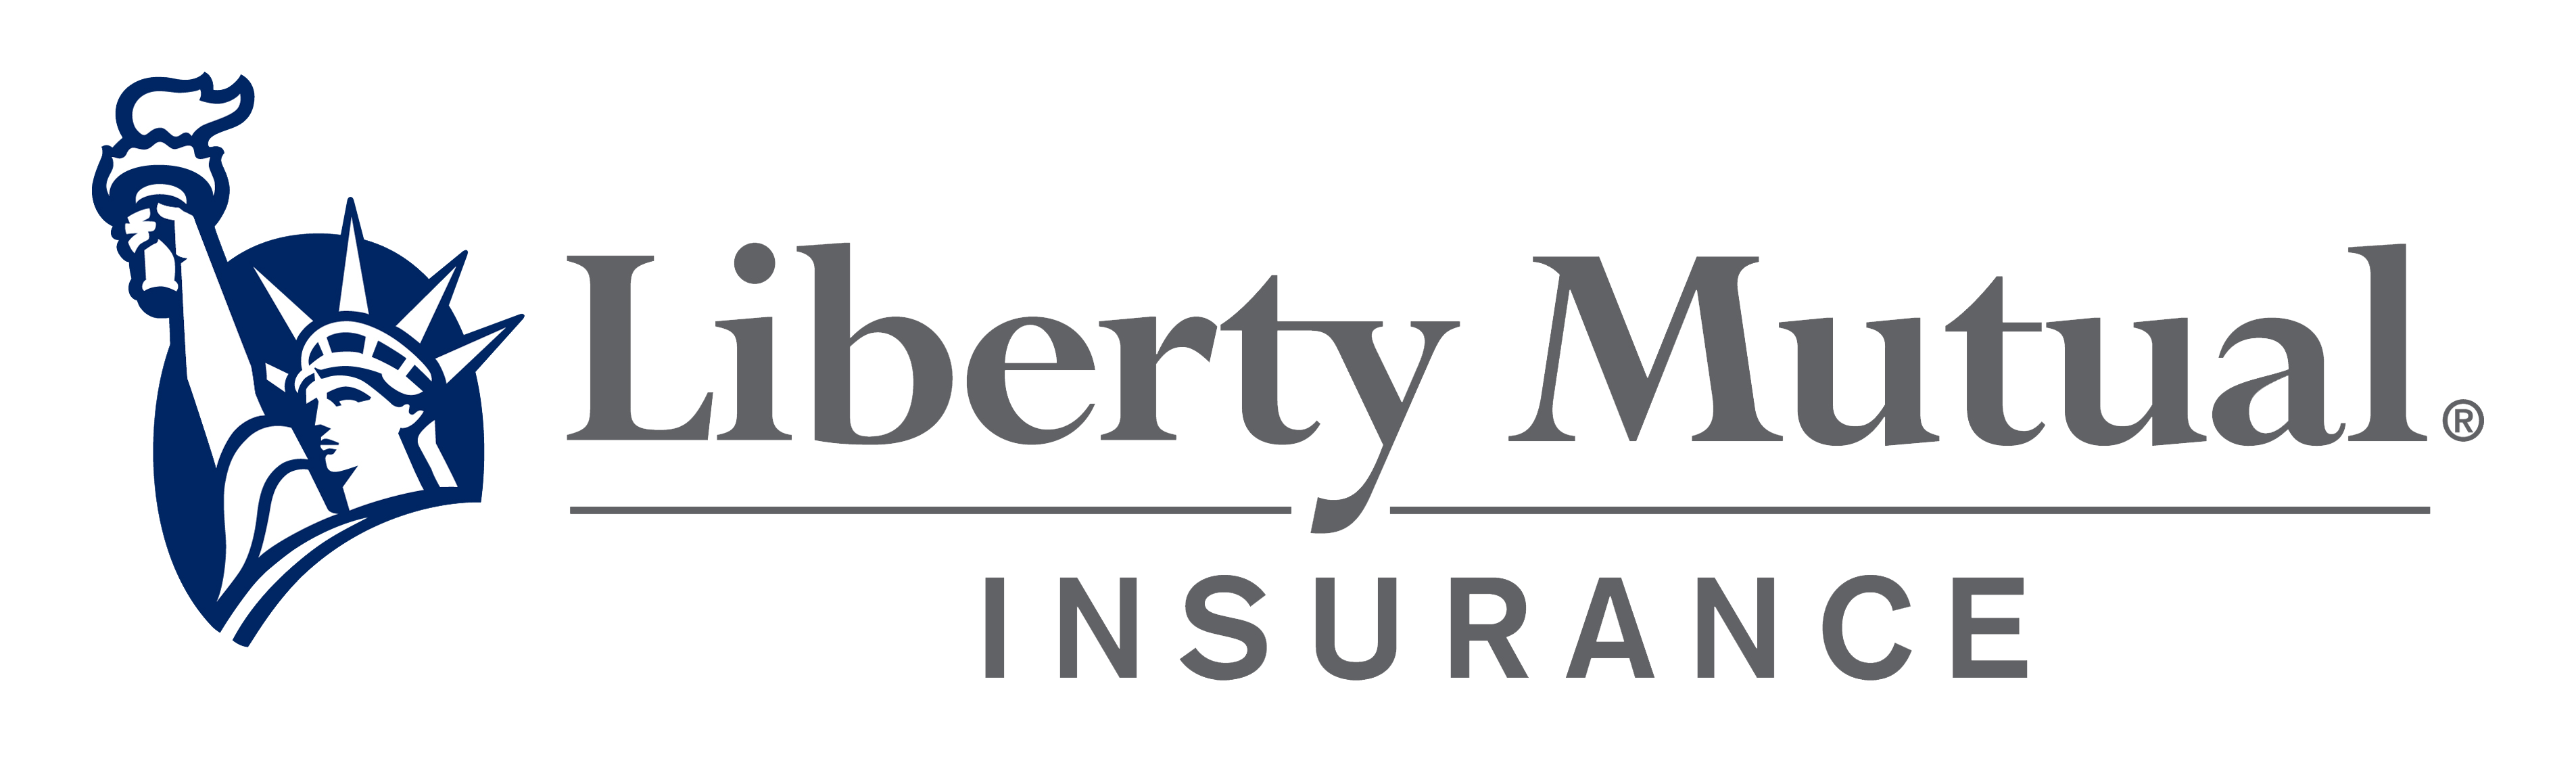 Liberty Mutual Insurance Unbiased 2020 Review The Zebra